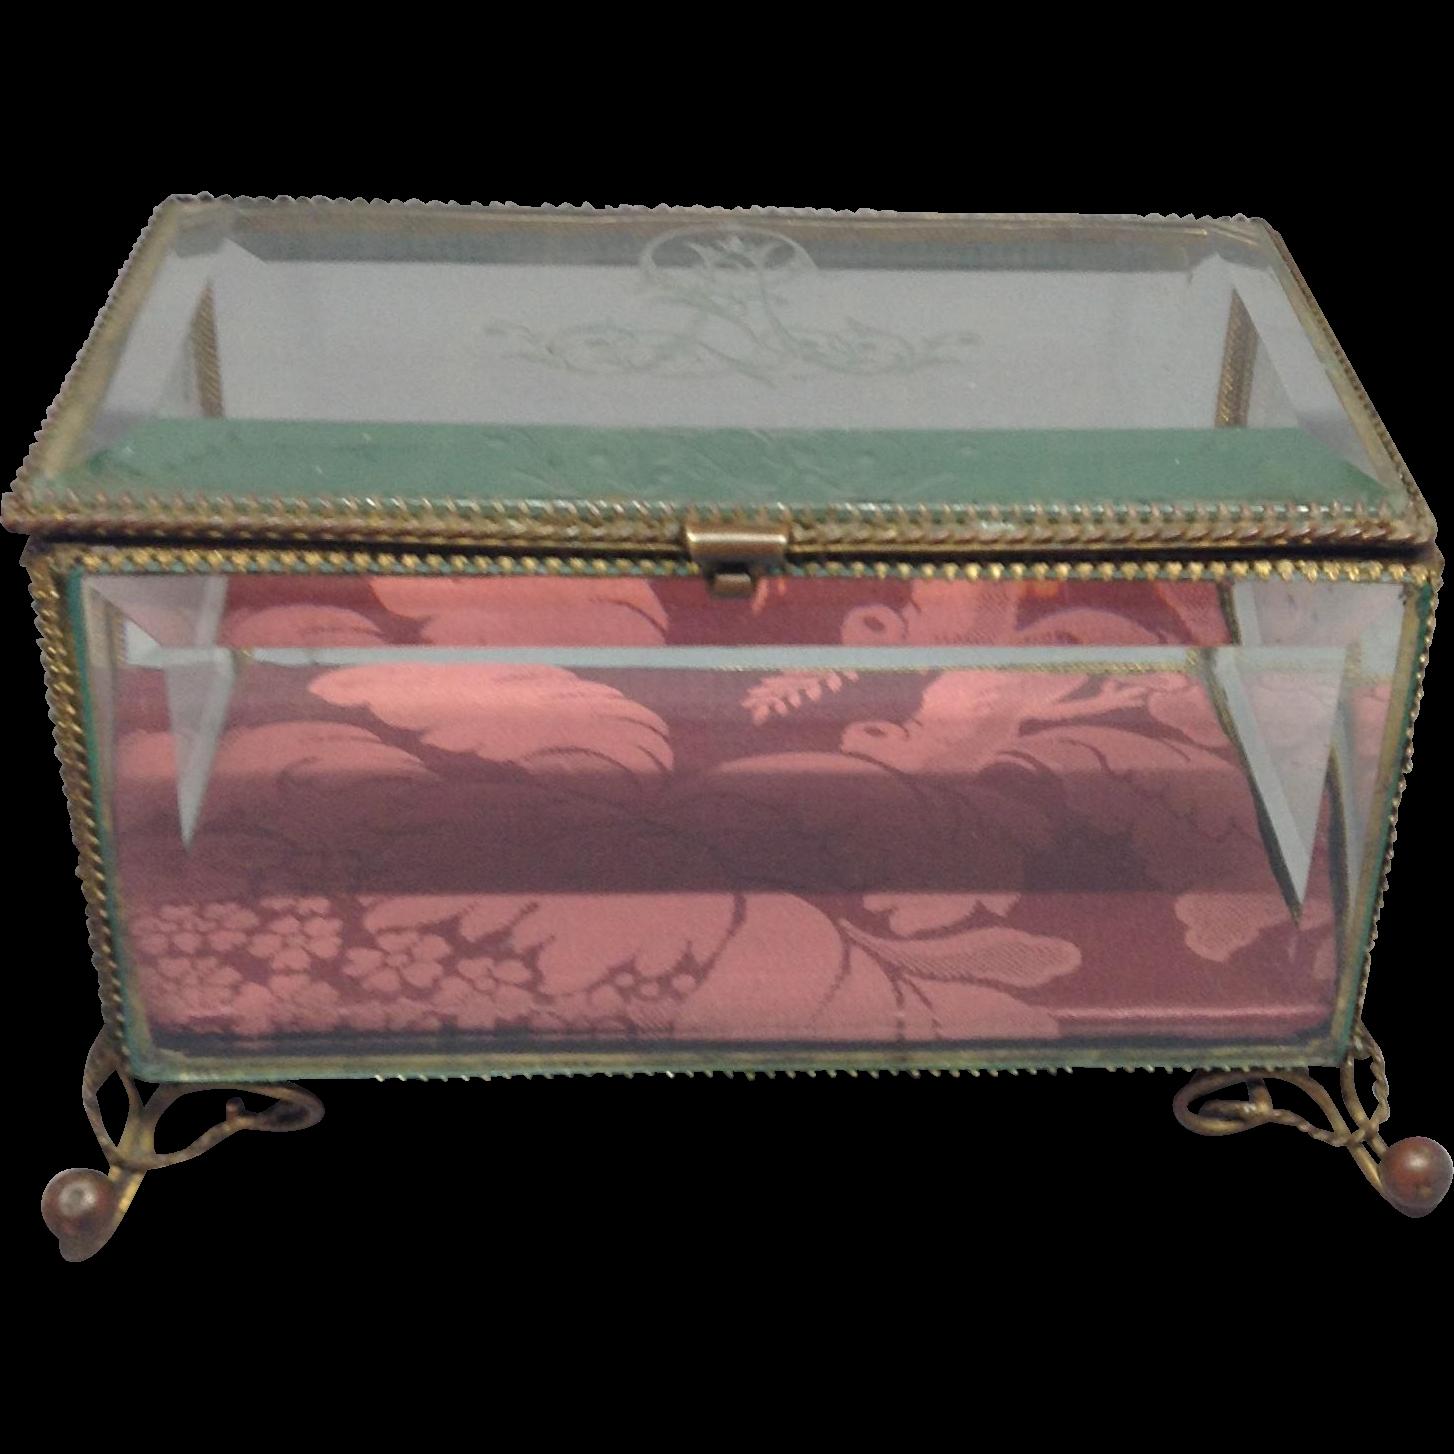 19th Century French Bride's Casket